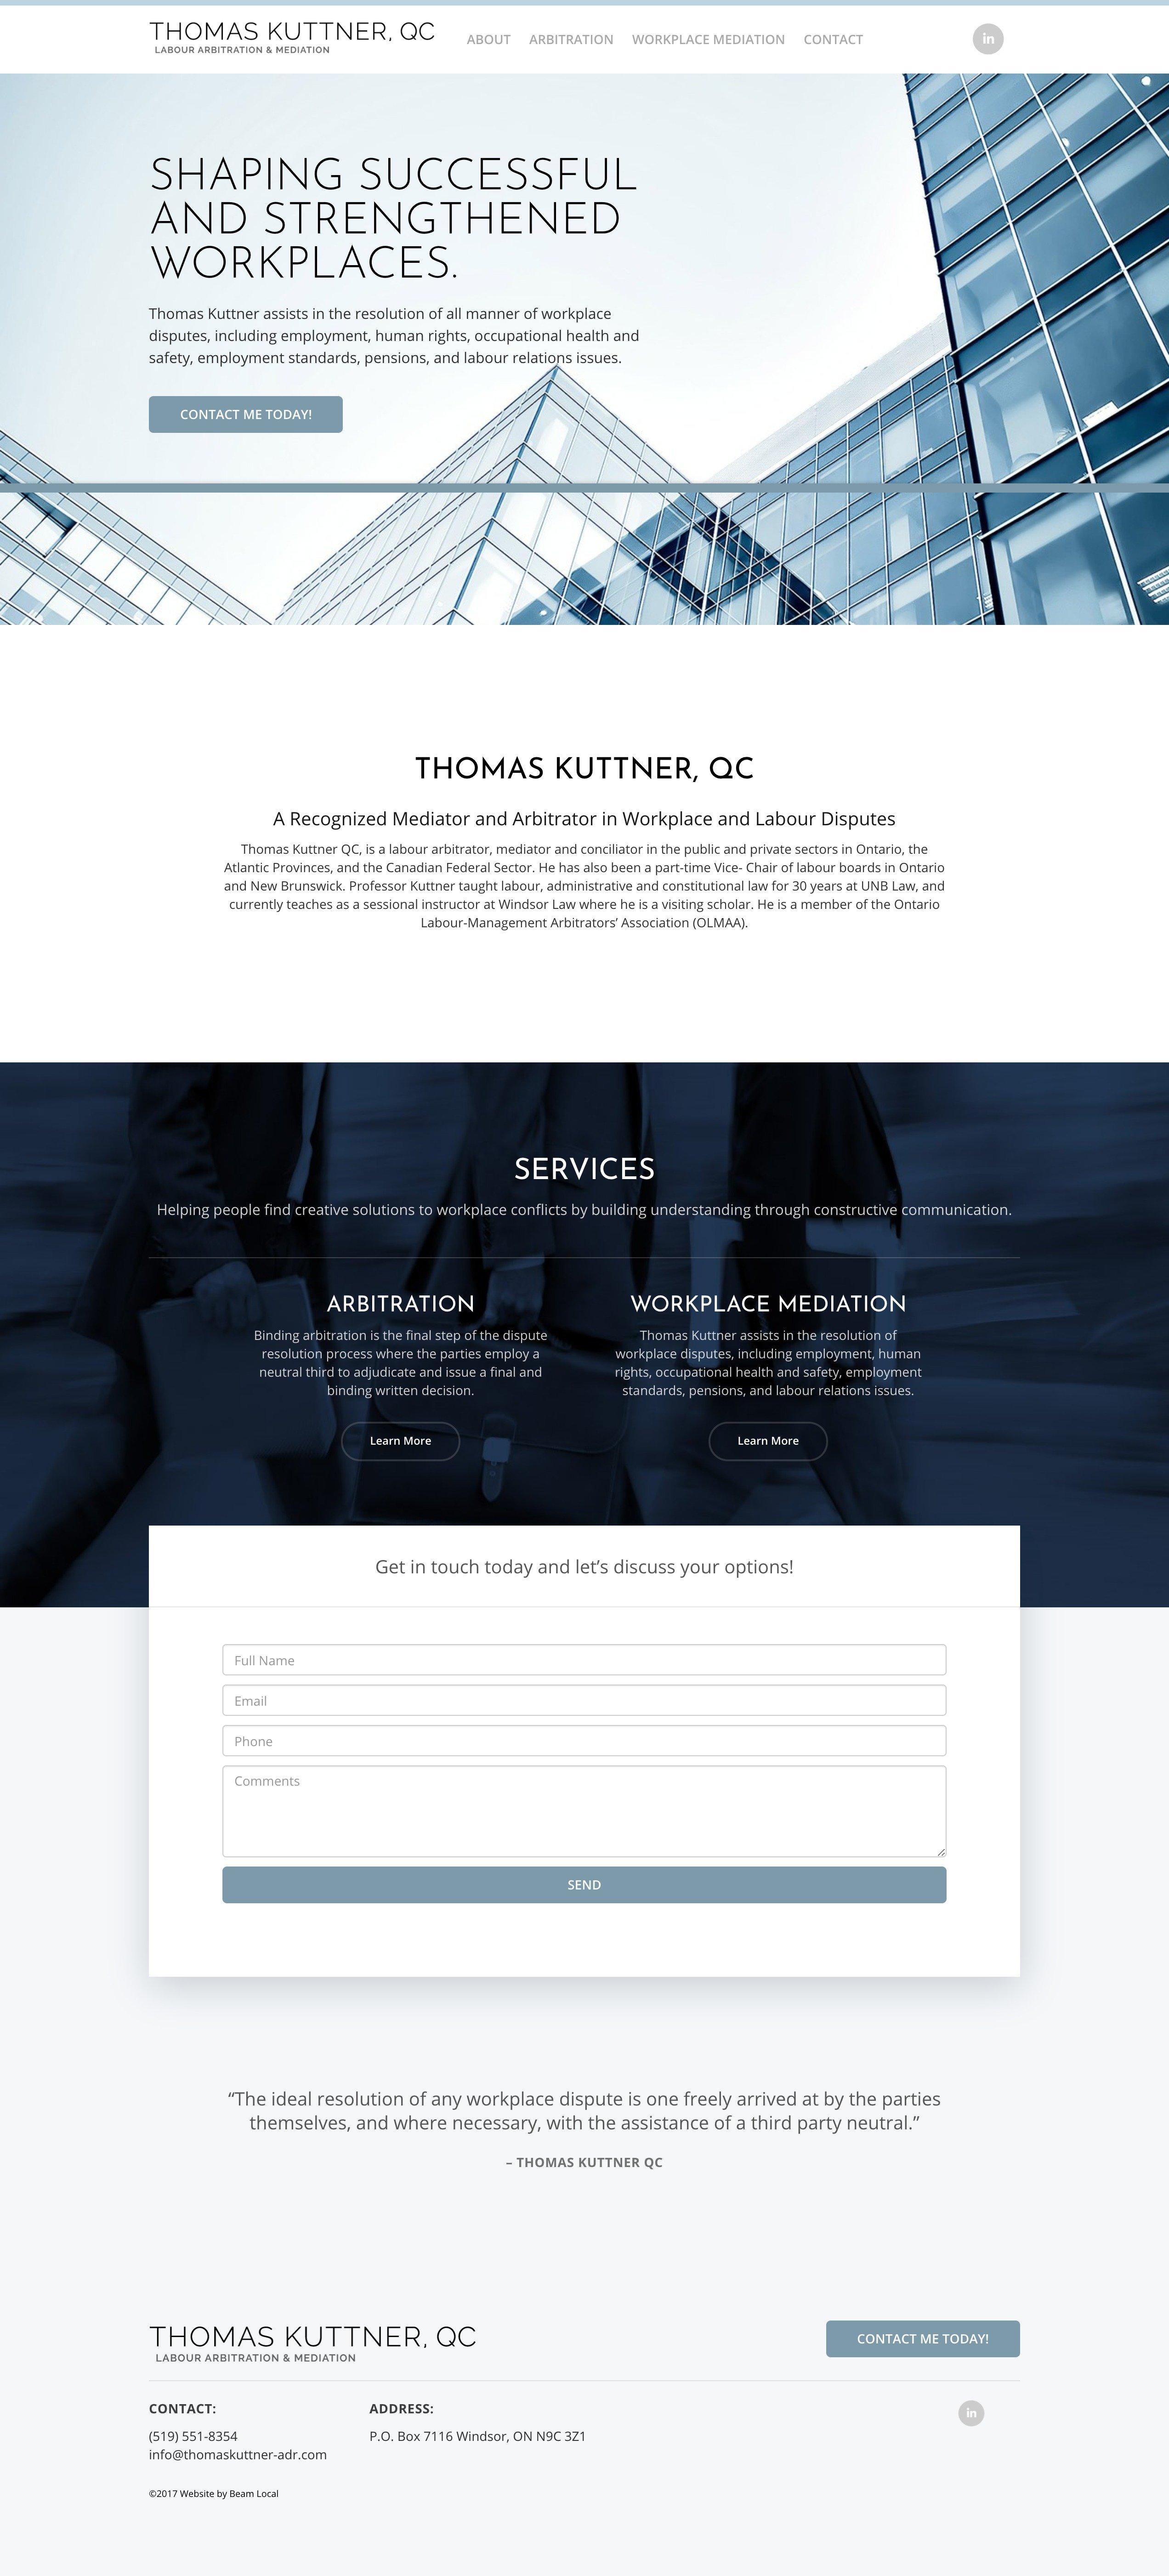 Thomas Kuttner Law- Legal Services Web Design -Lawyer Web Design